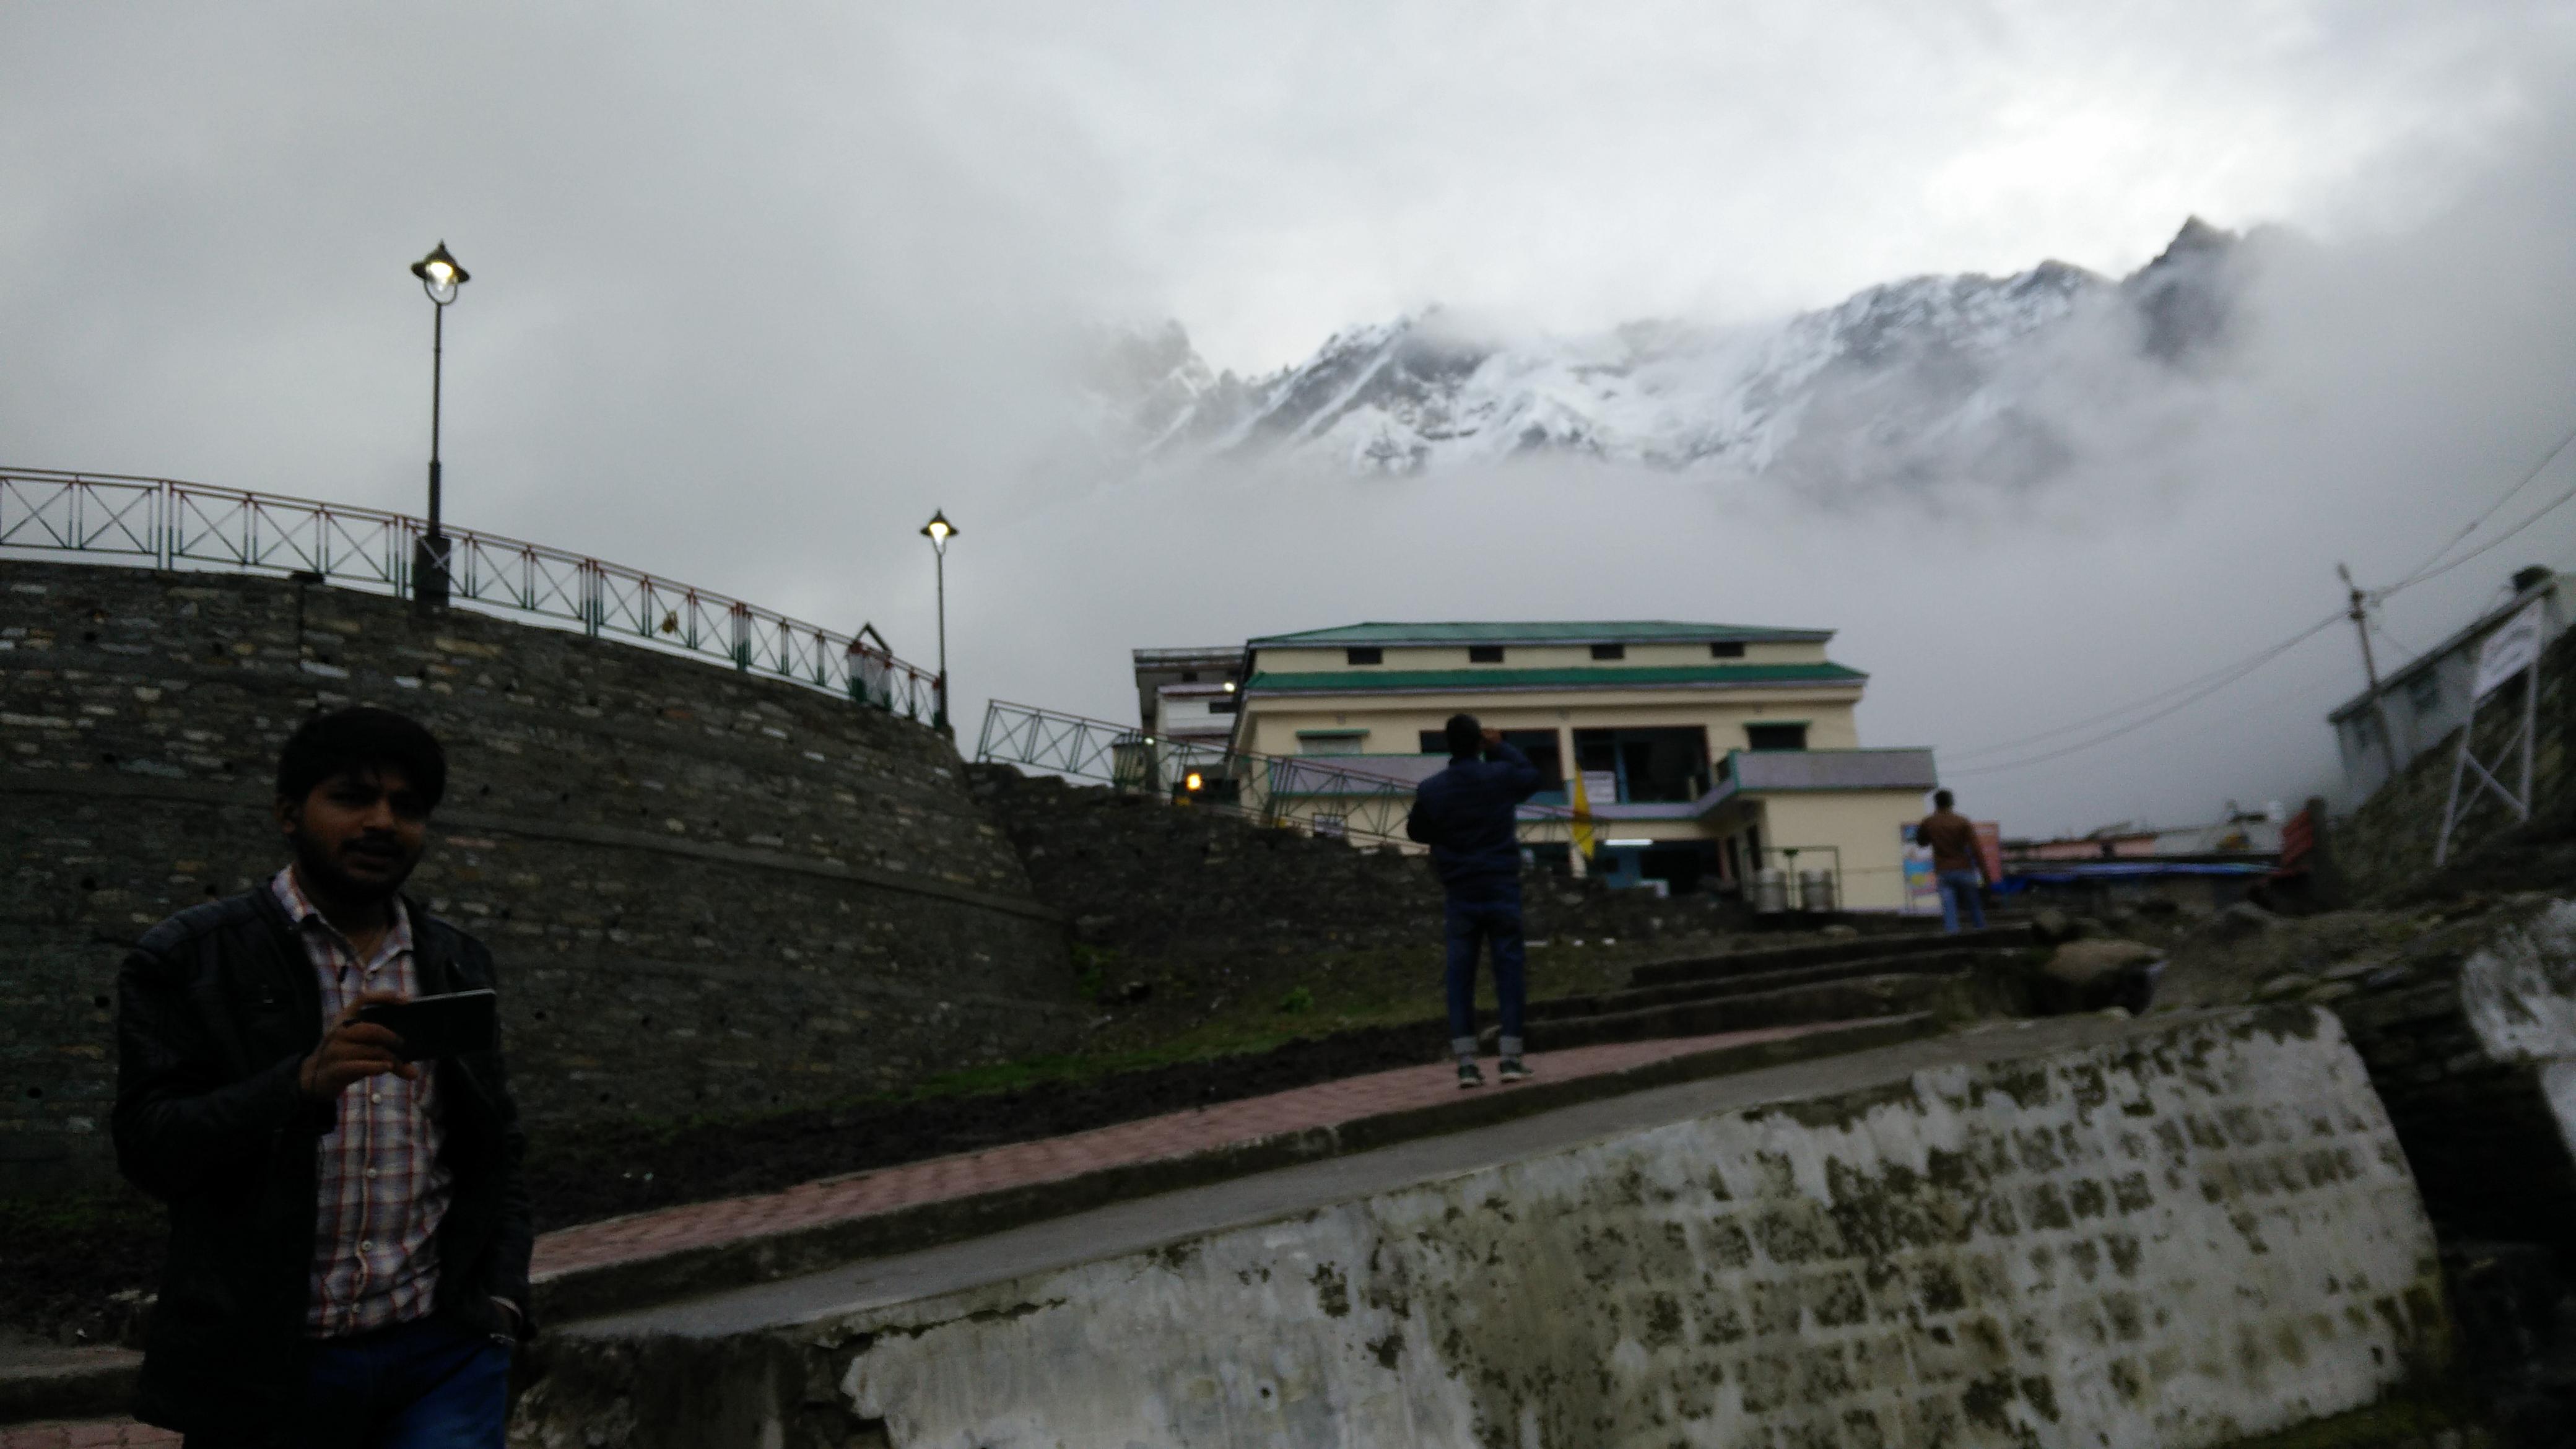 img_20180820_070136-jpg.6891 Shrines in Himalayas